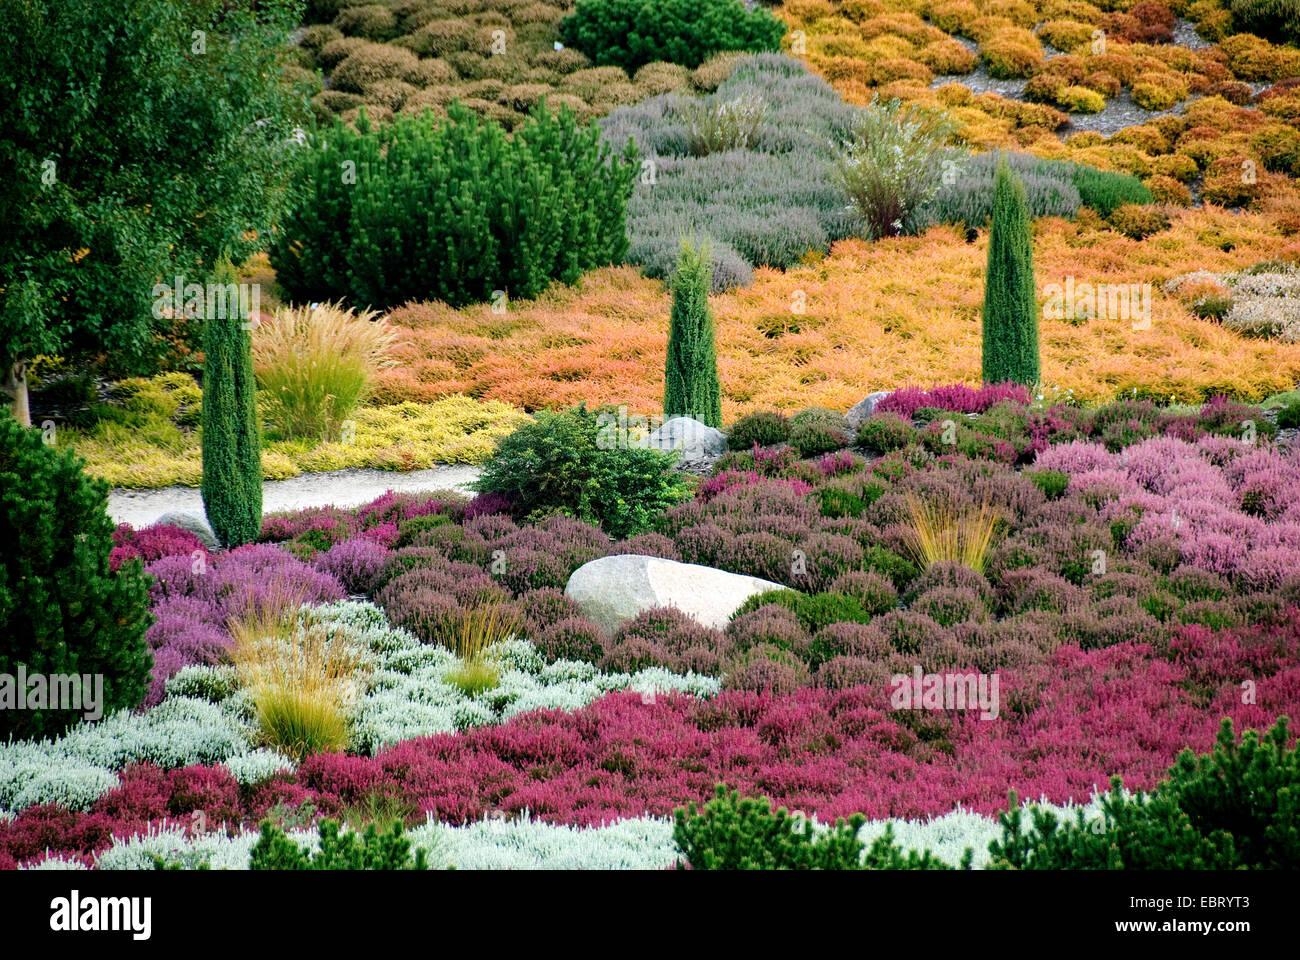 heather, ling (Calluna vulgaris), heath garden, Germany, Findlingspark Nochten - Stock Image